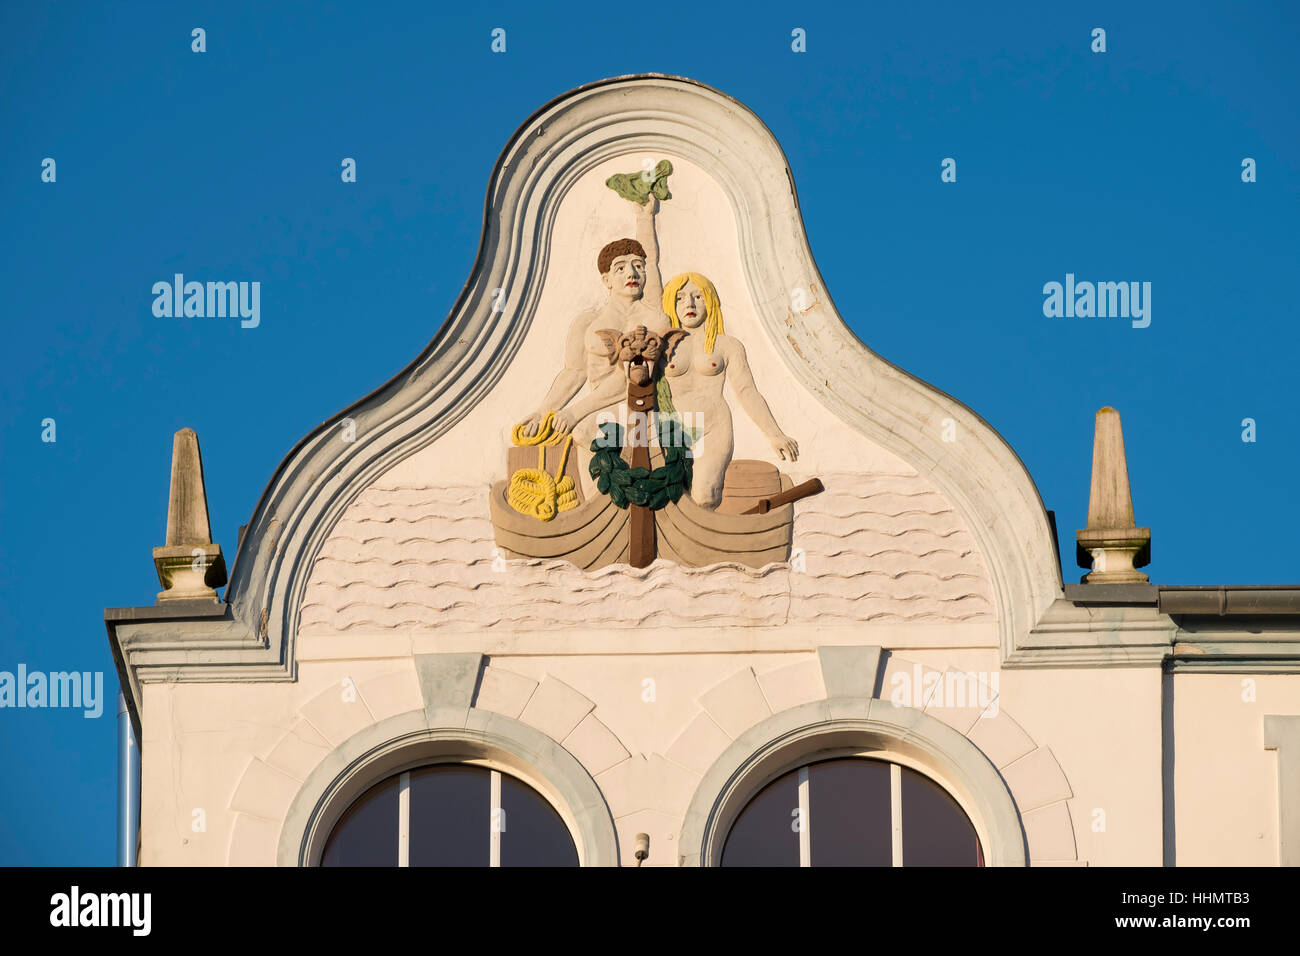 Gable, Hotel Germania, Bäder architettura, architettura resort, Bansin, Usedom, Meclemburgo-Pomerania, Germania Immagini Stock